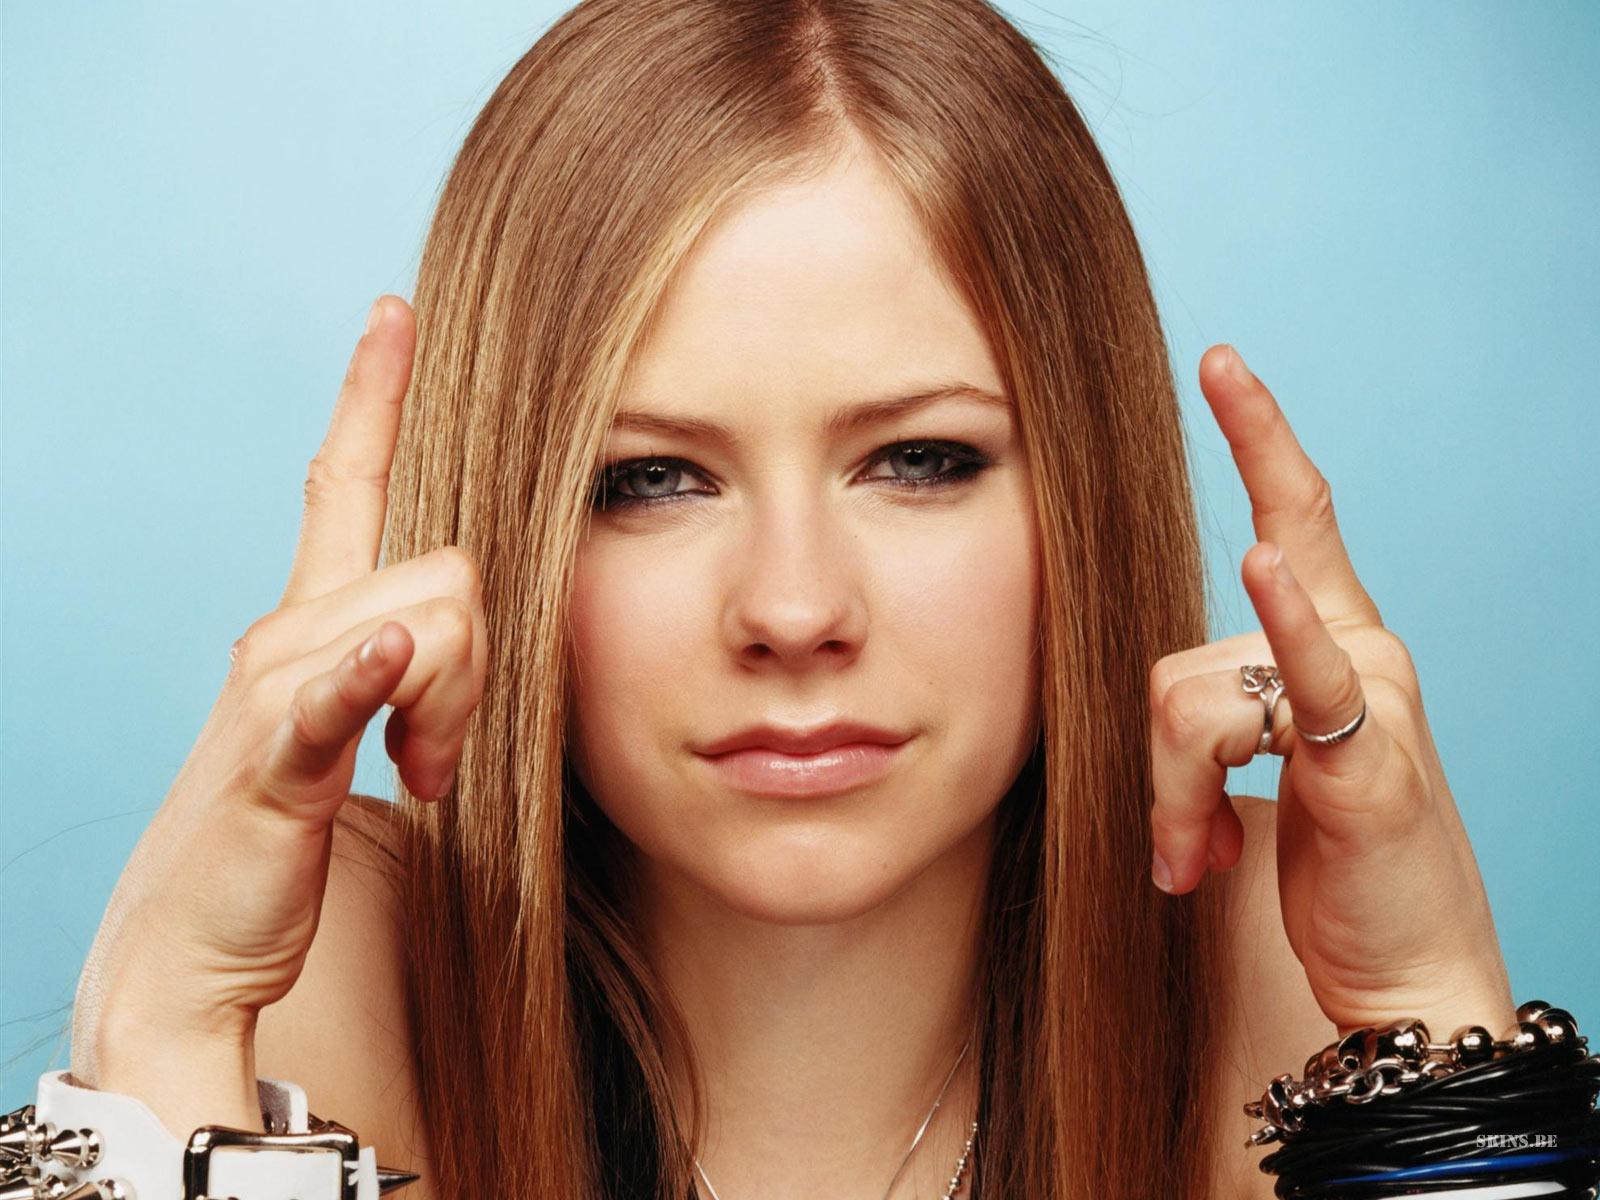 http://1.bp.blogspot.com/_GCAuqodmOE4/TSlAsgsaFtI/AAAAAAAAGyU/oJgJaeaNvKc/s1600/Avril+Lavigne+Picture+%252821%2529.jpg